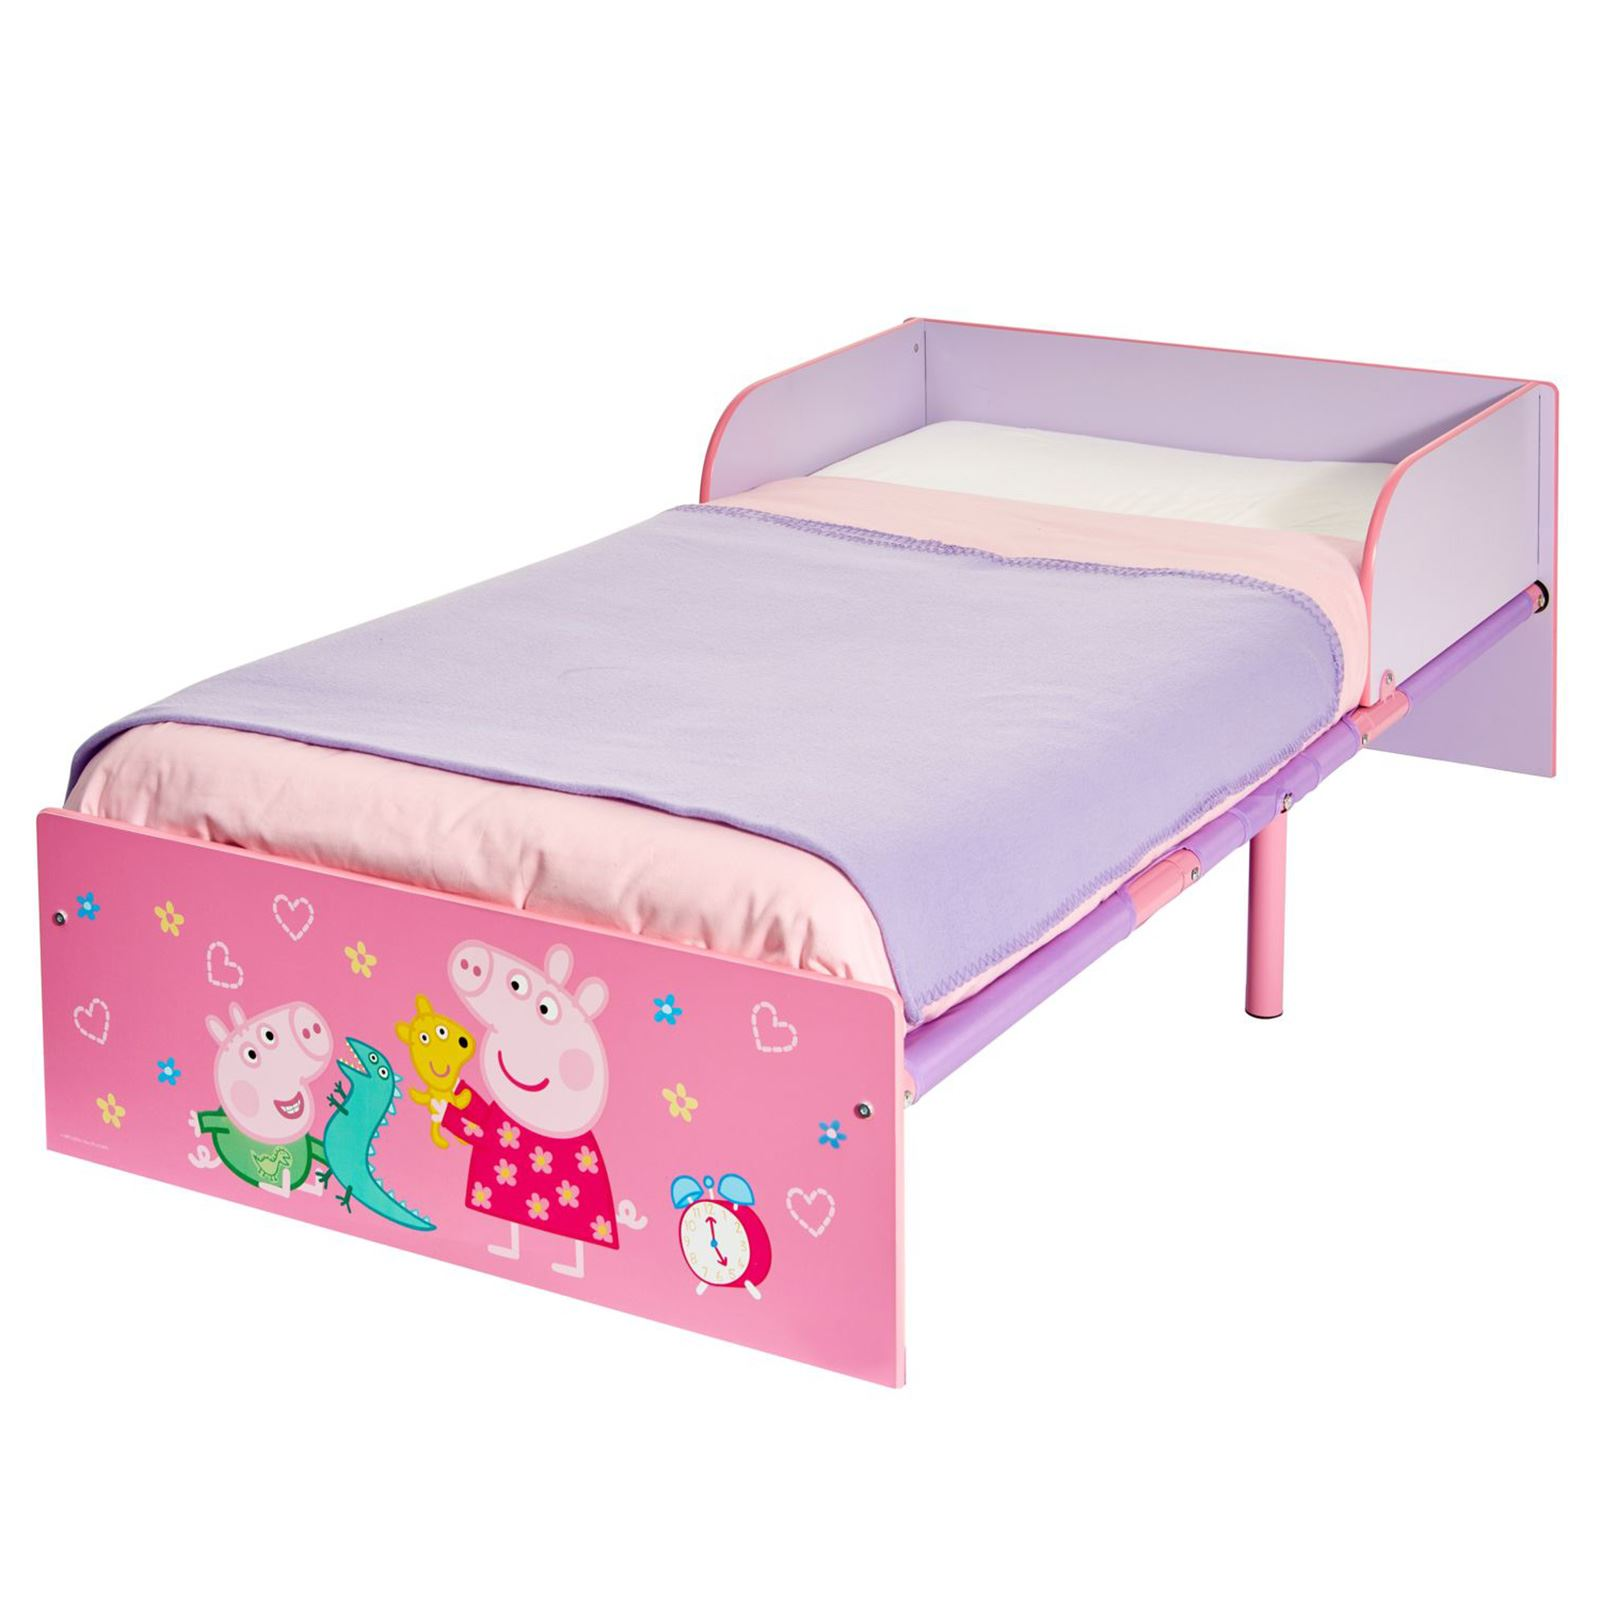 miniatura 57 - KIDS CHARACTER TODDLER BEDS - BOYS GIRLS BEDROOM DISNEY